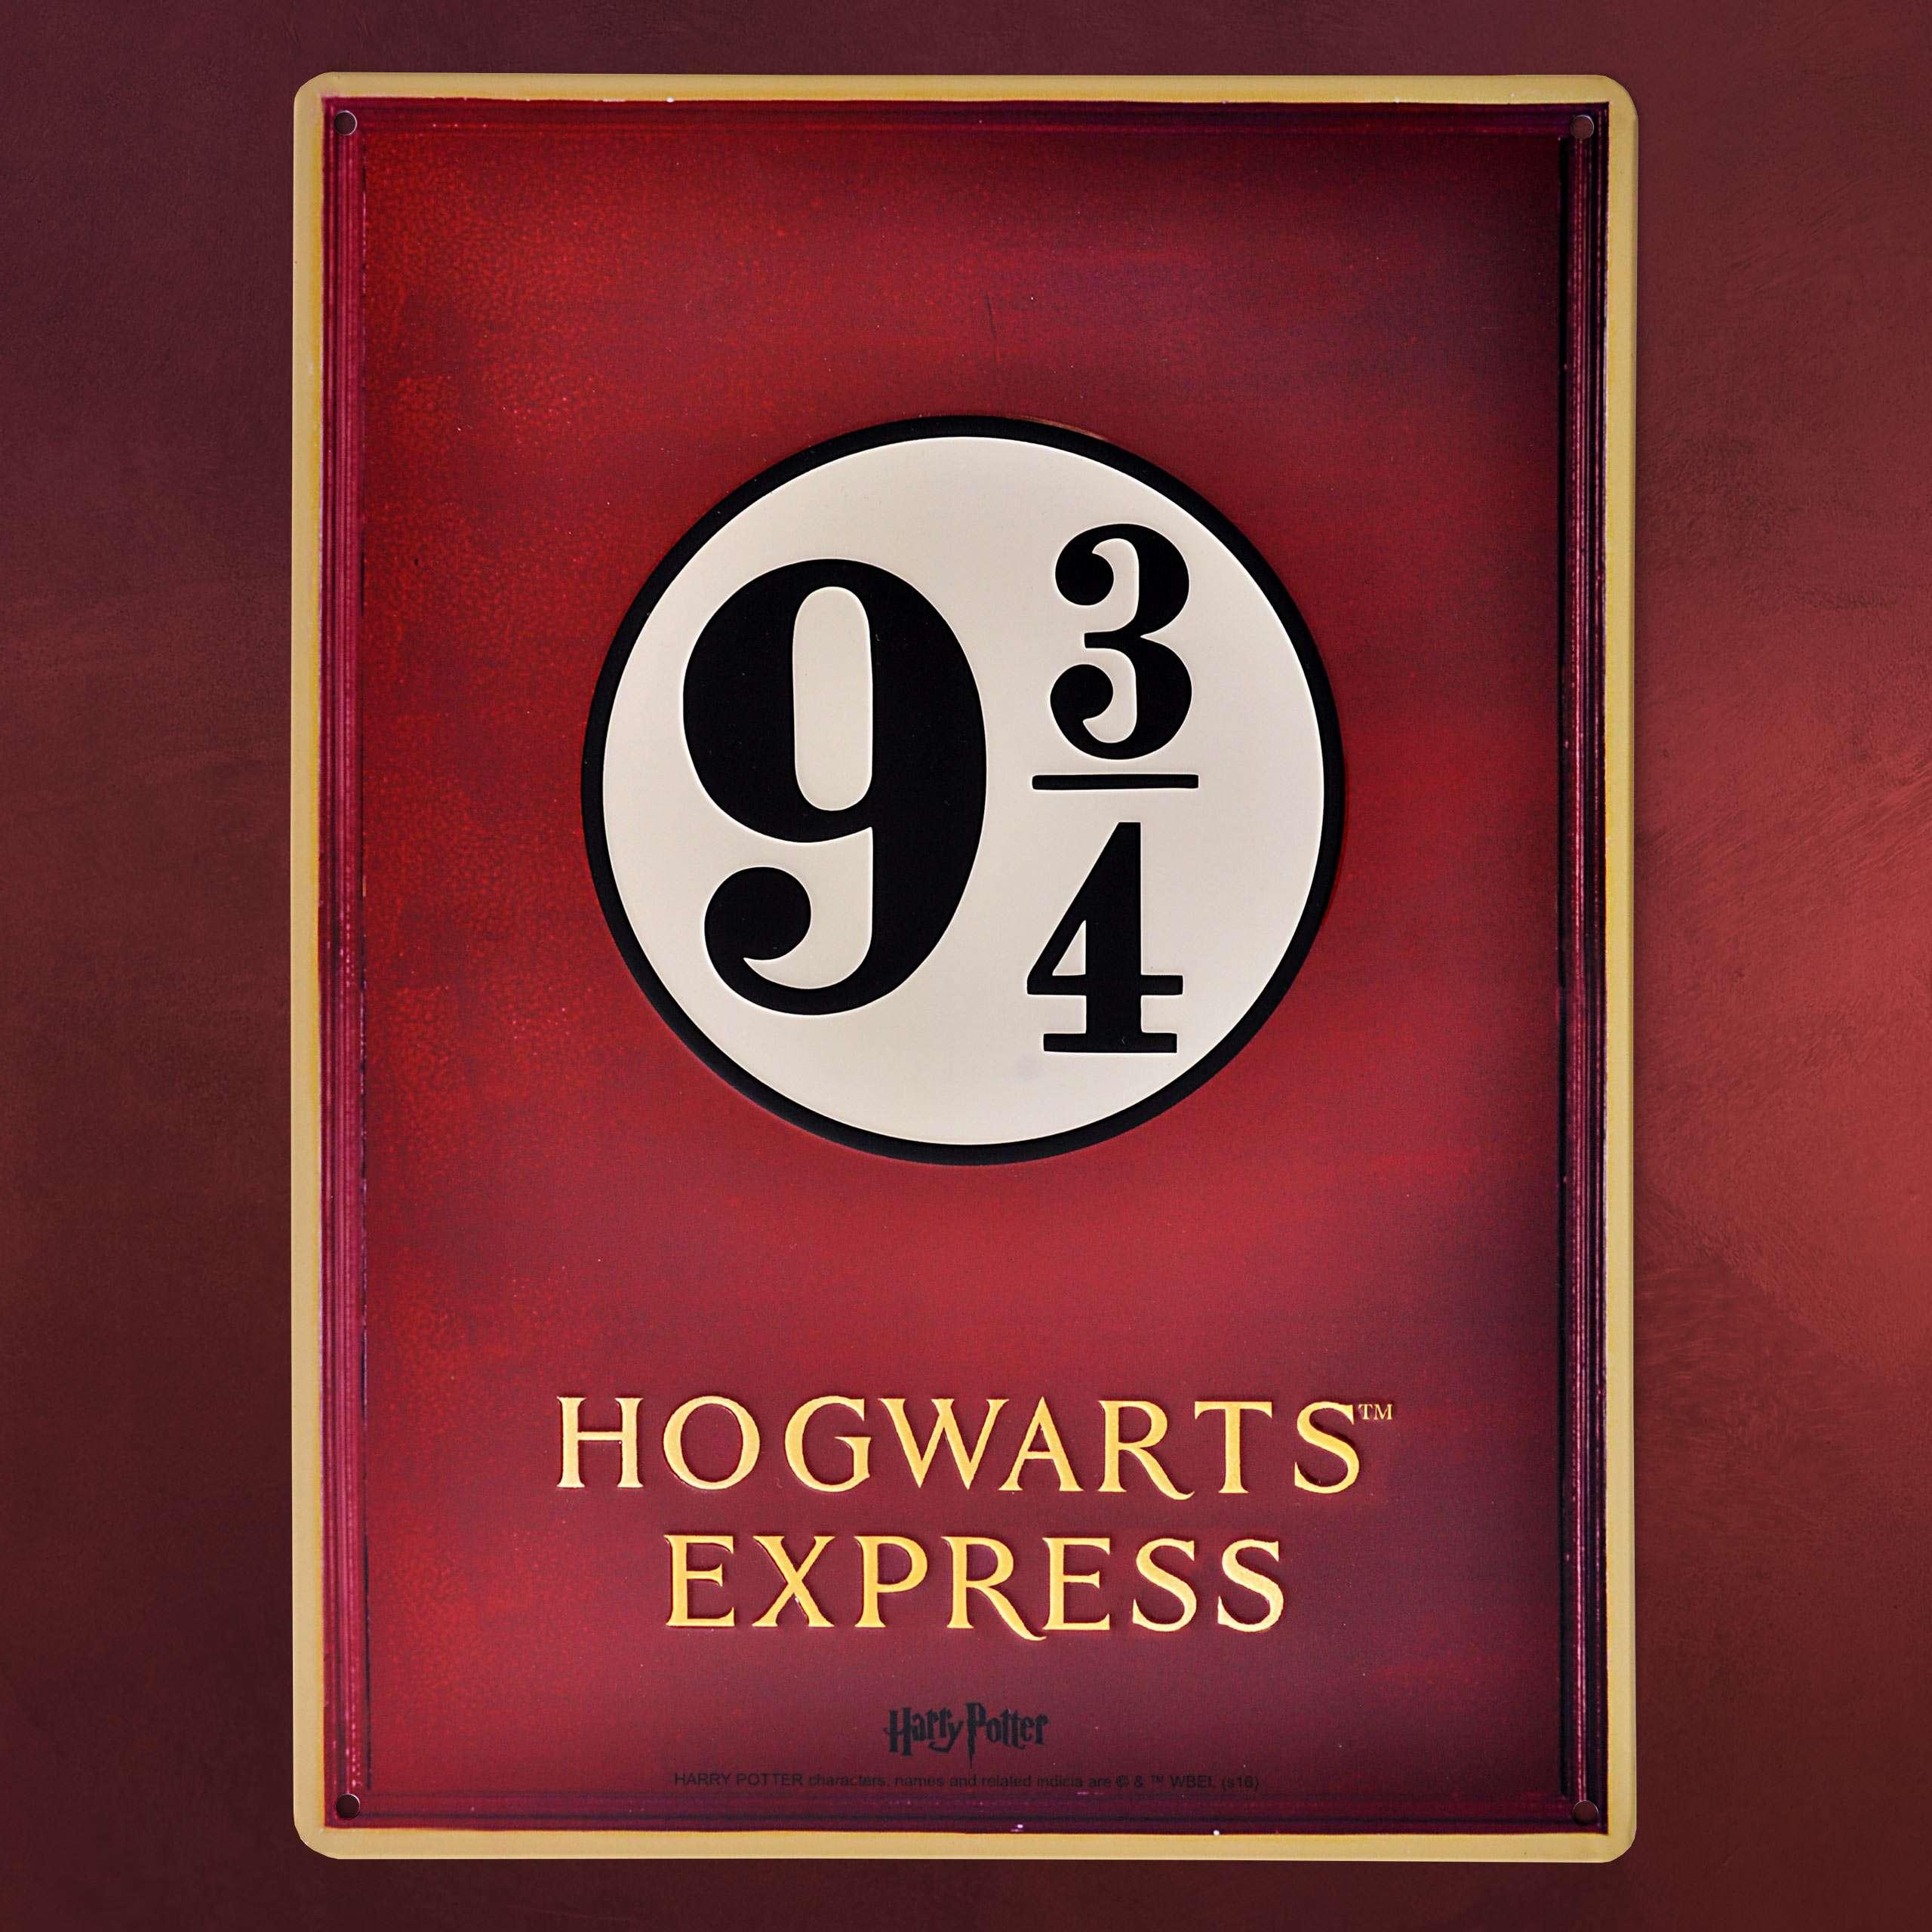 Hogwarts Express Kinder Müslischüssel Müslischale 9 3//4 Harry Potter